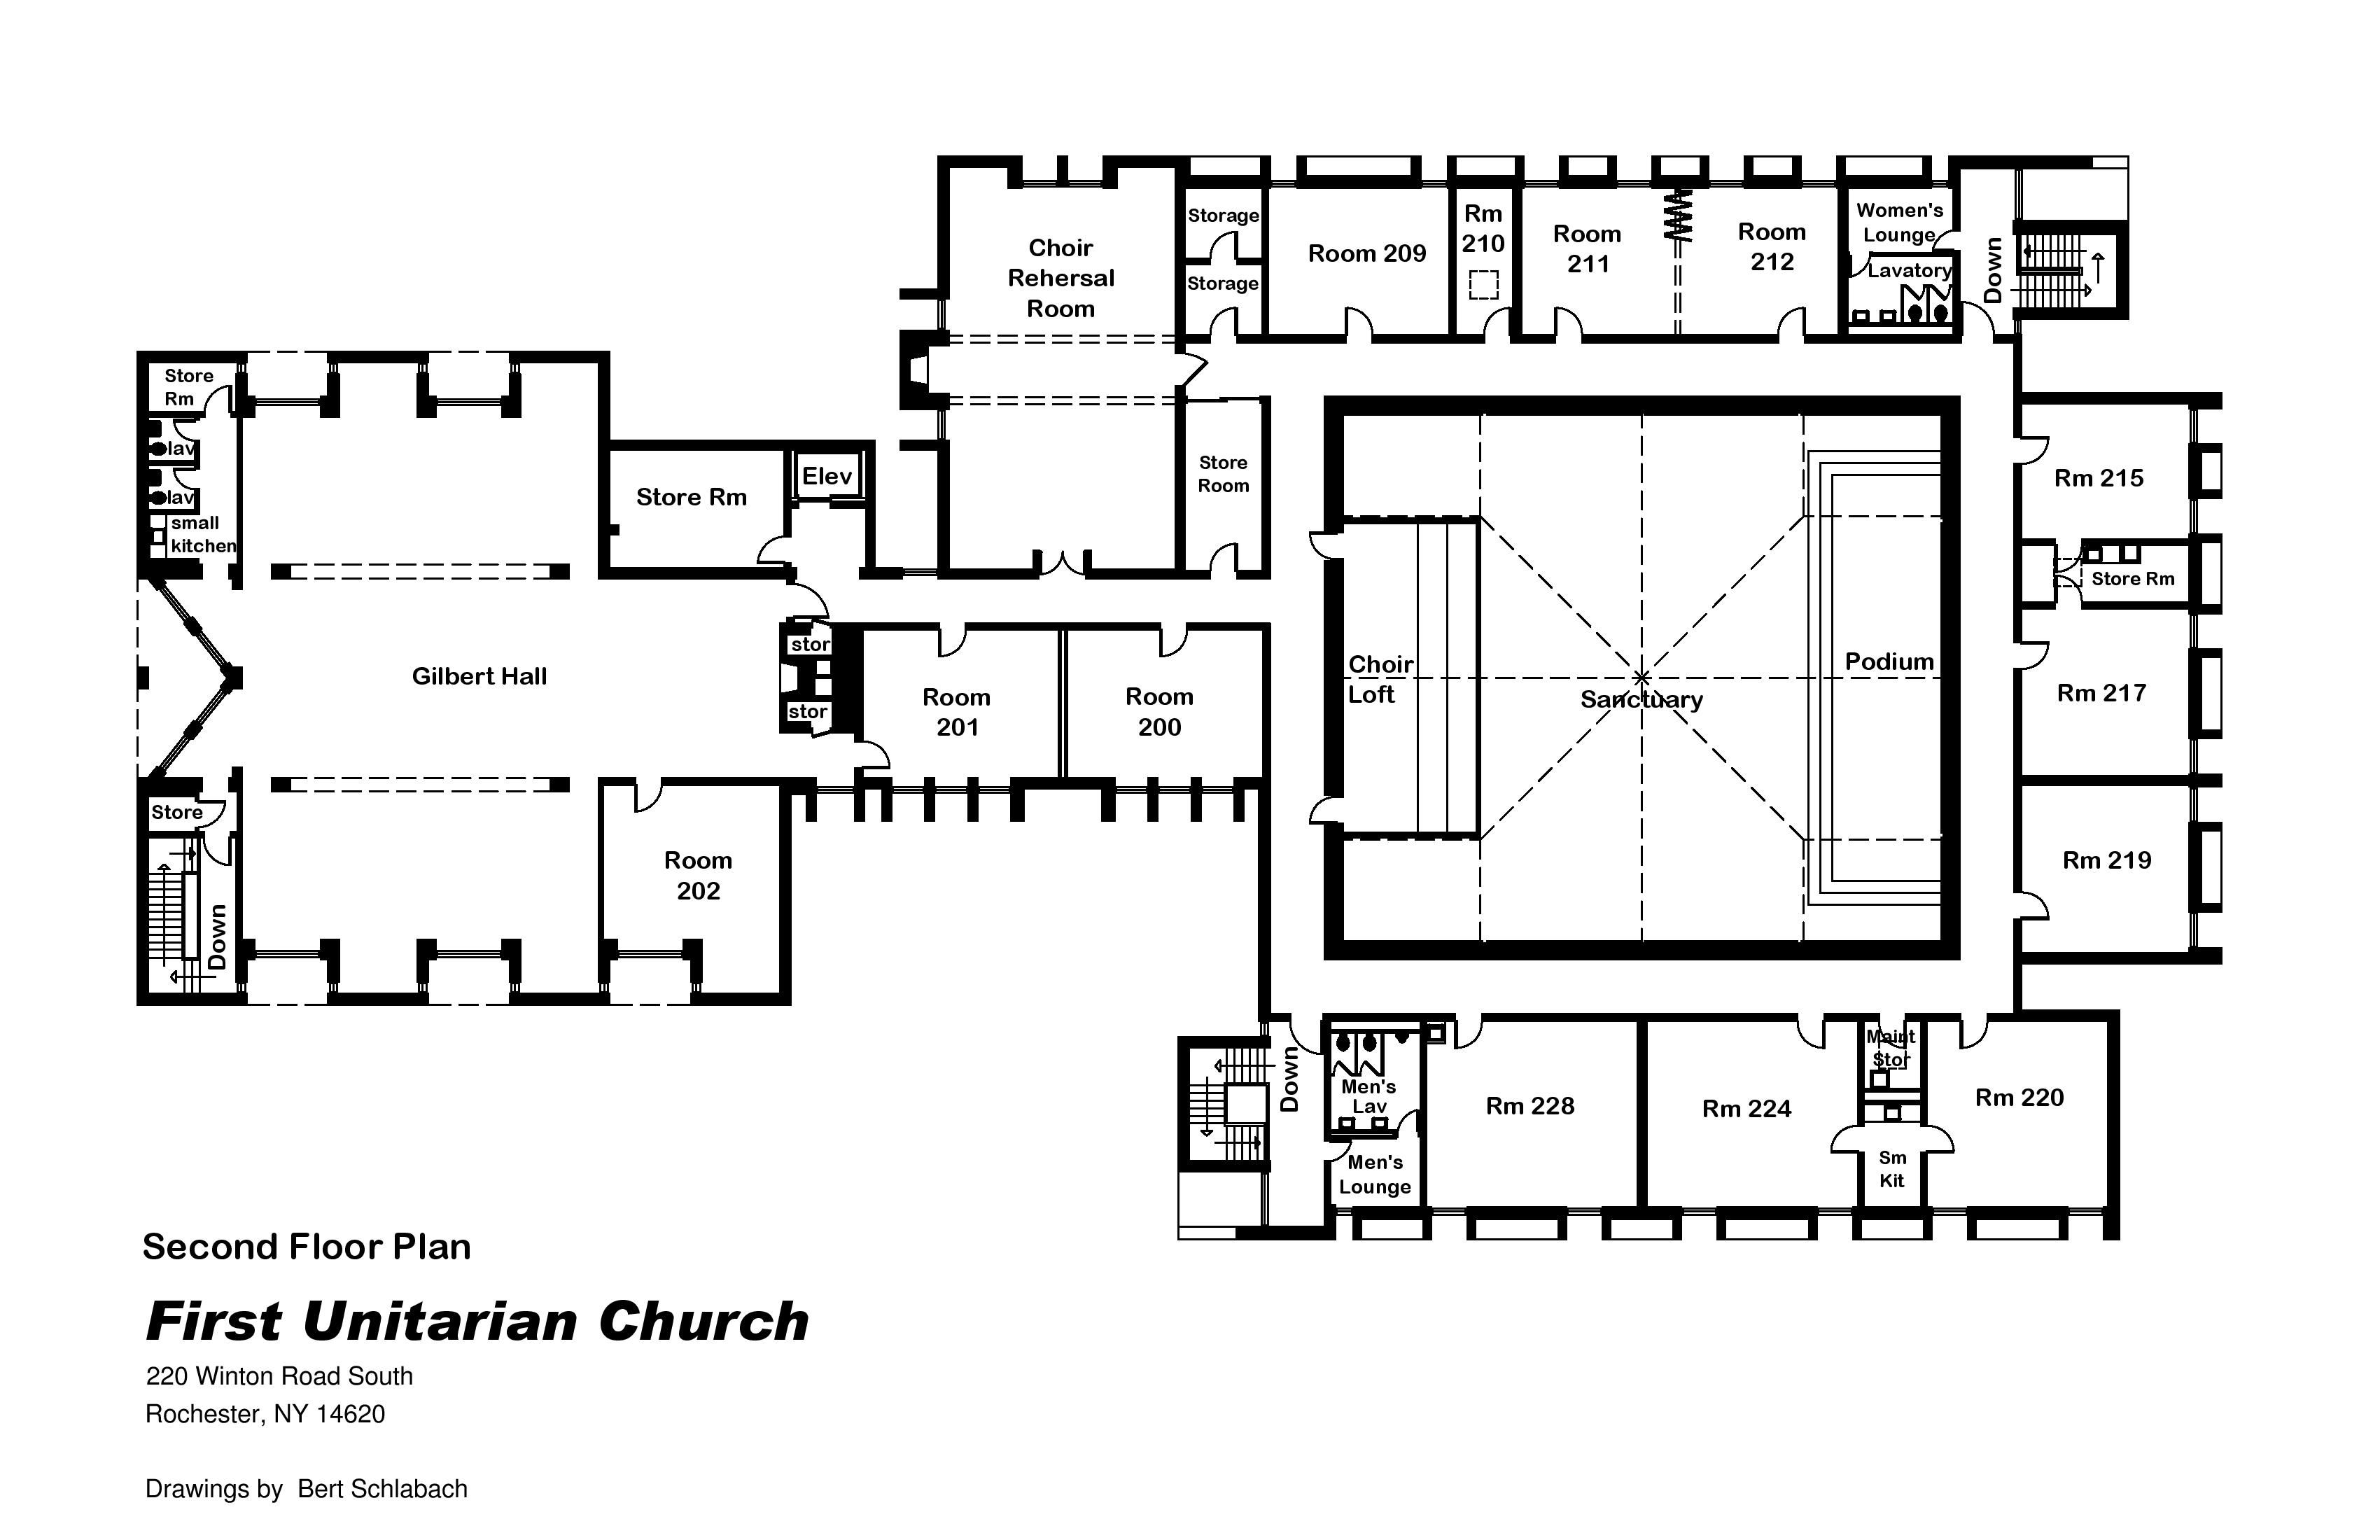 philippine catholic school standards pdf